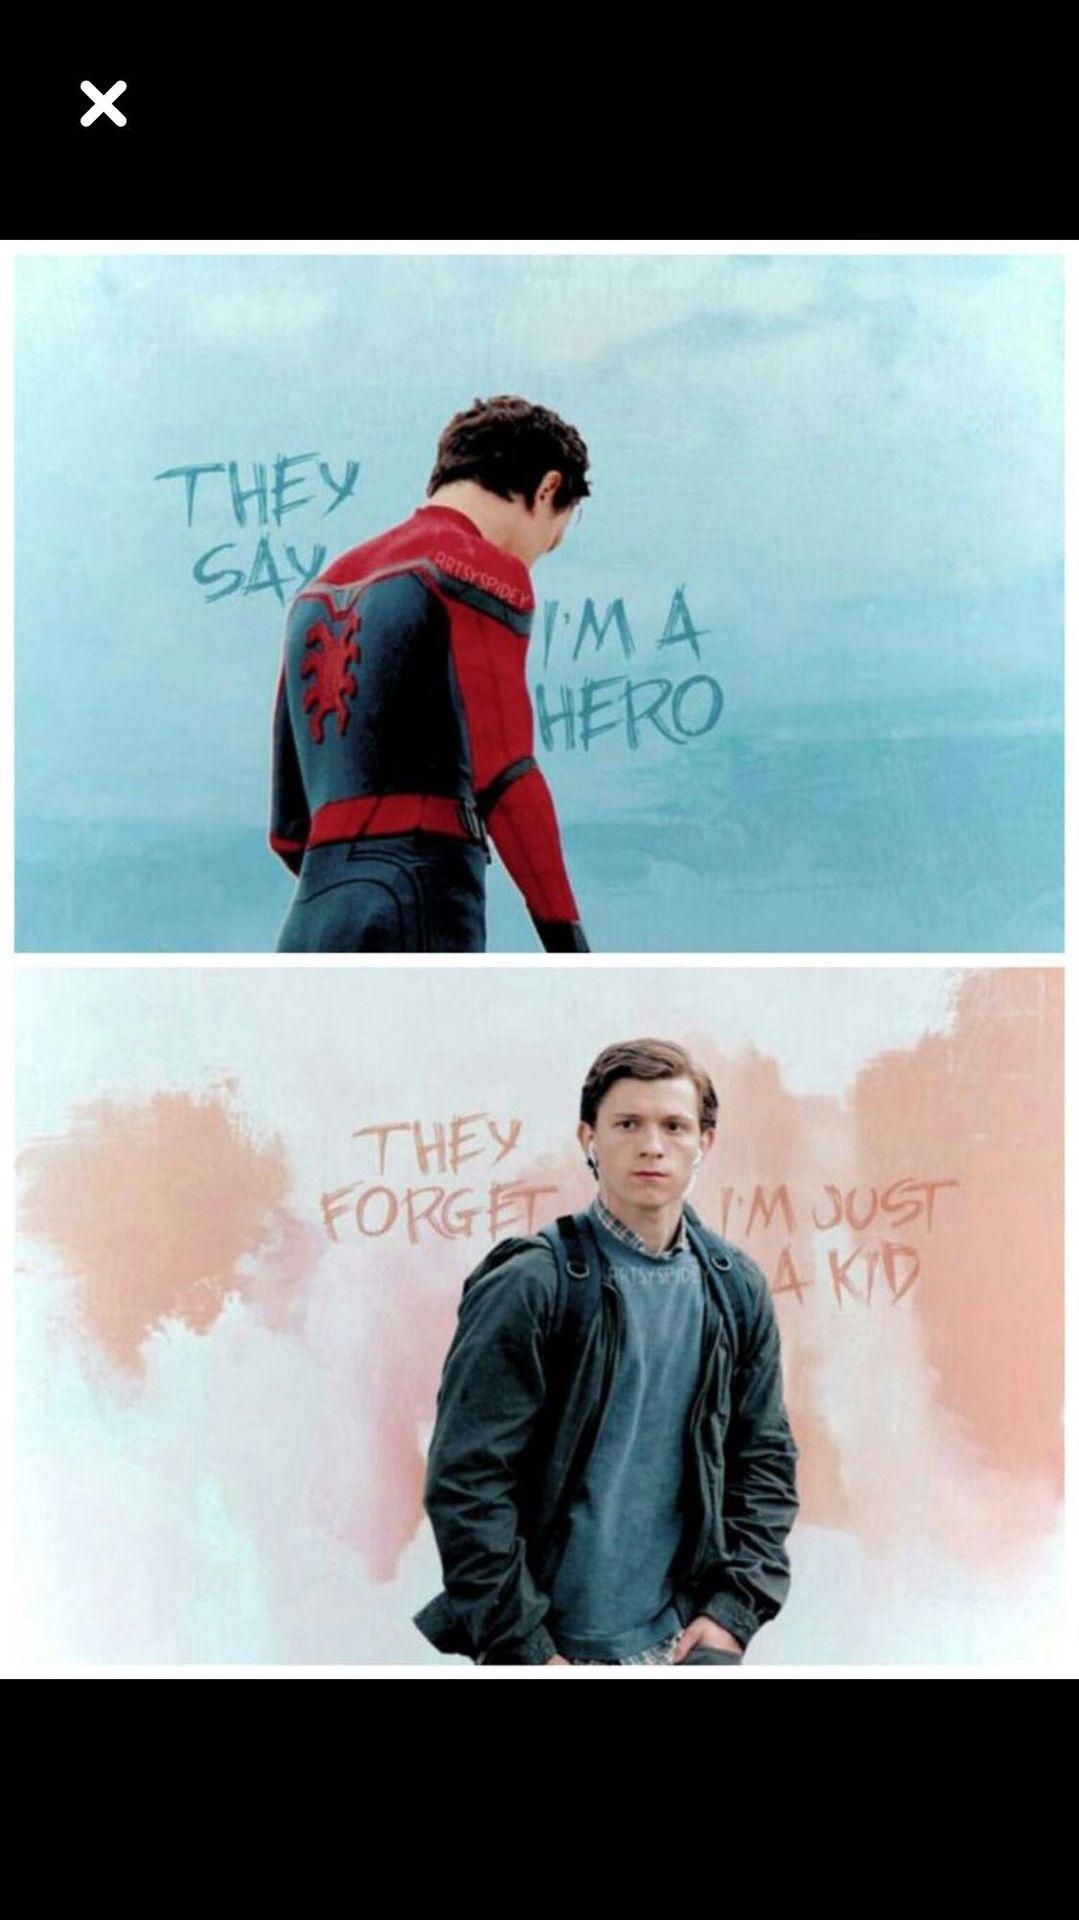 Avenger Imagines - Steve Rogers' Daughter // A Peter Parker